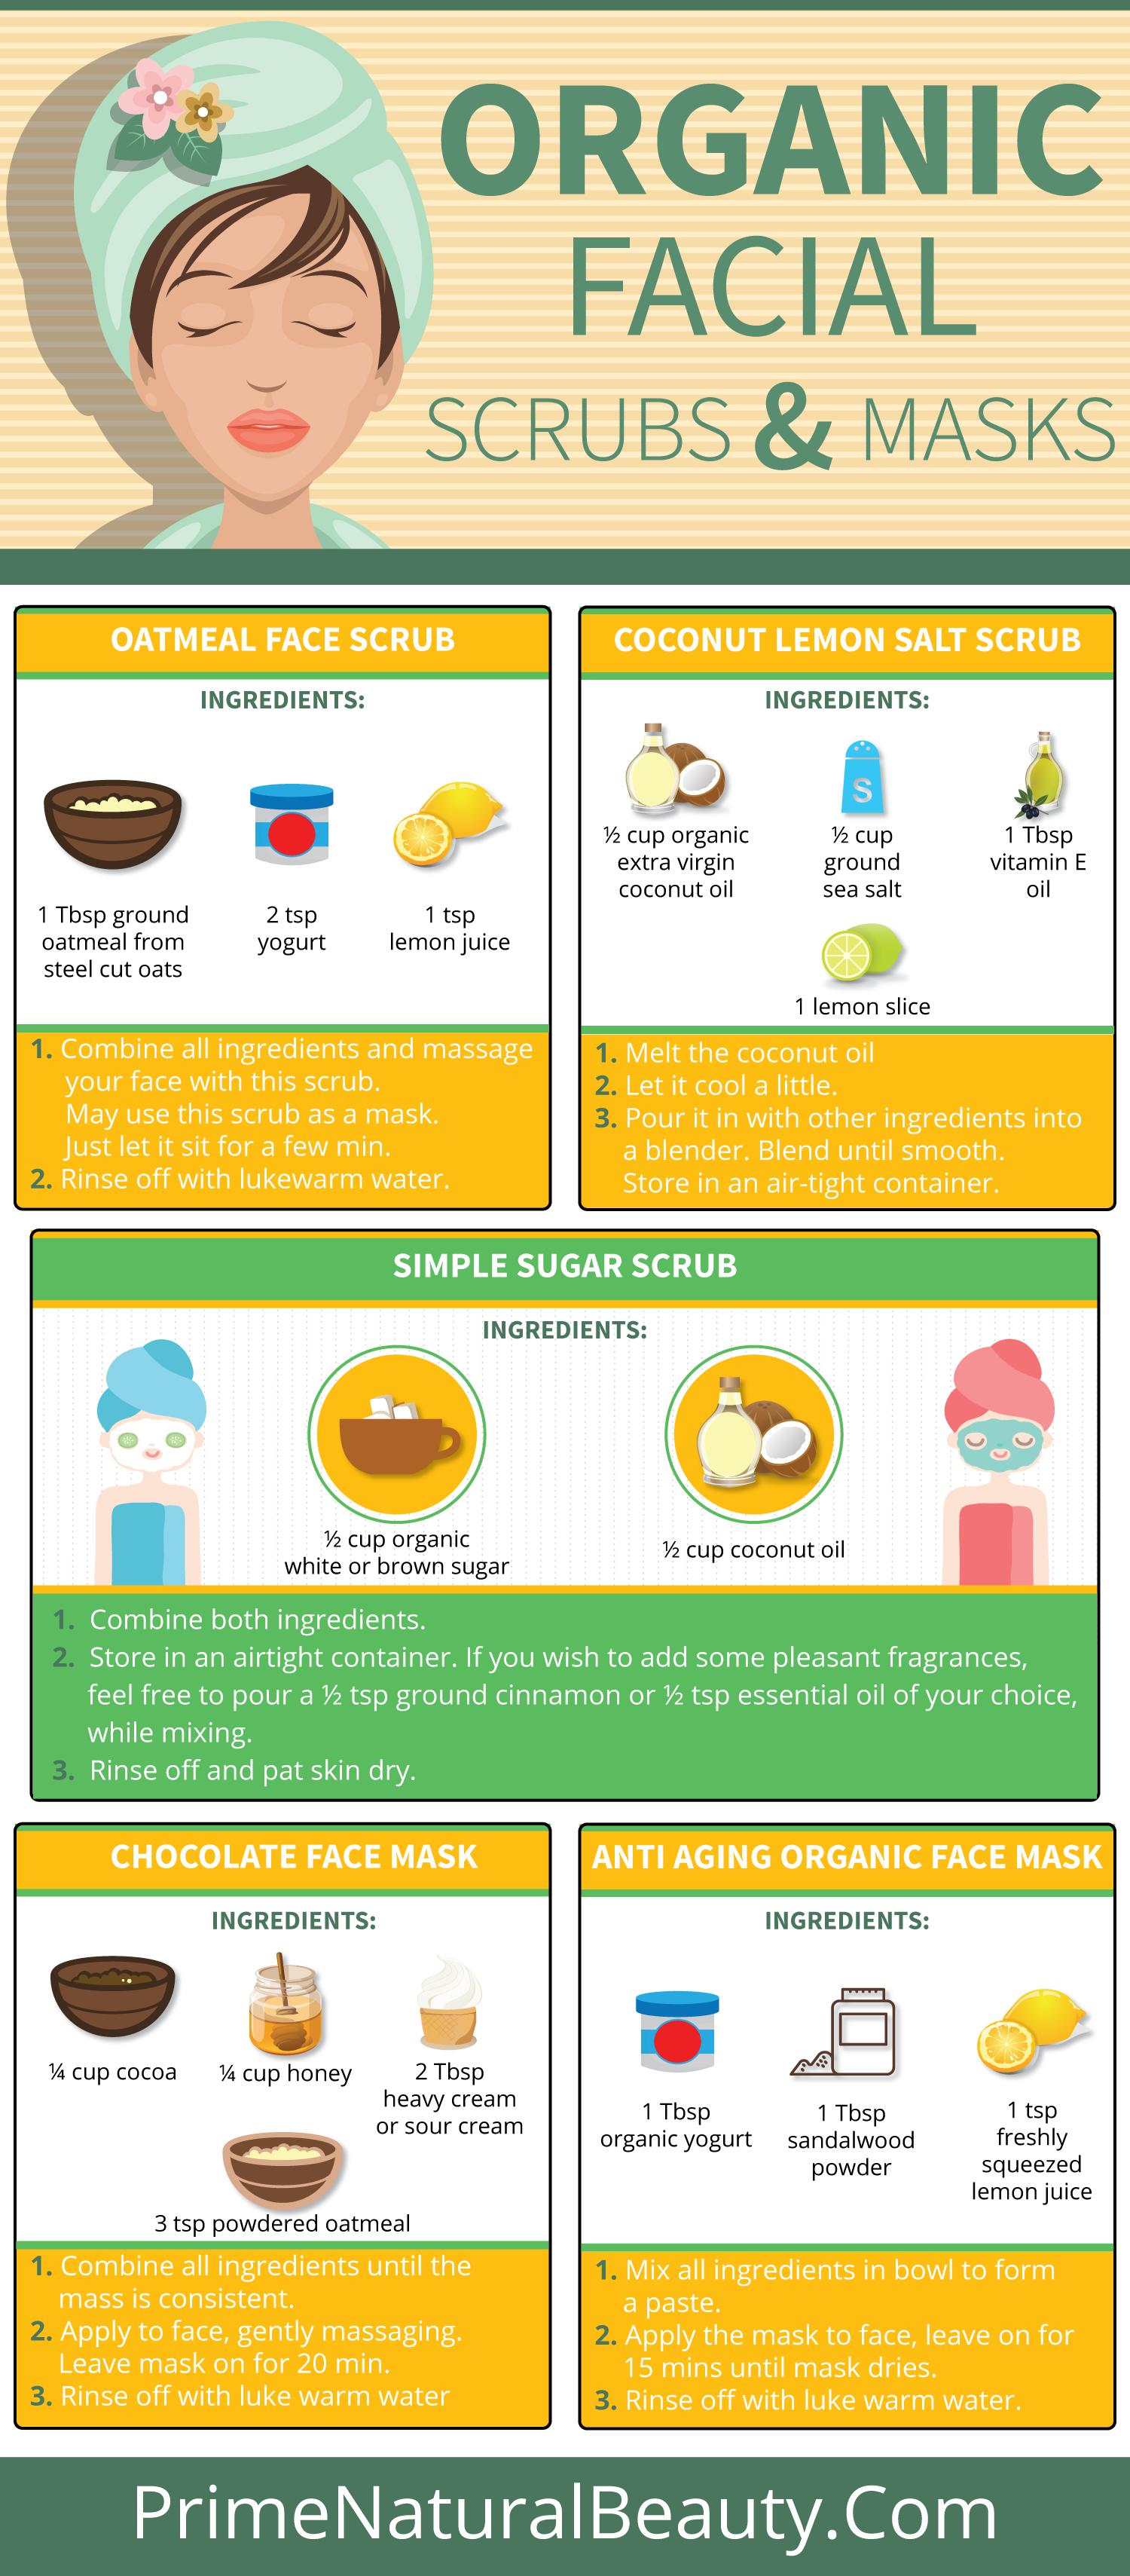 Organic Facial Scrub and Mask Recipes